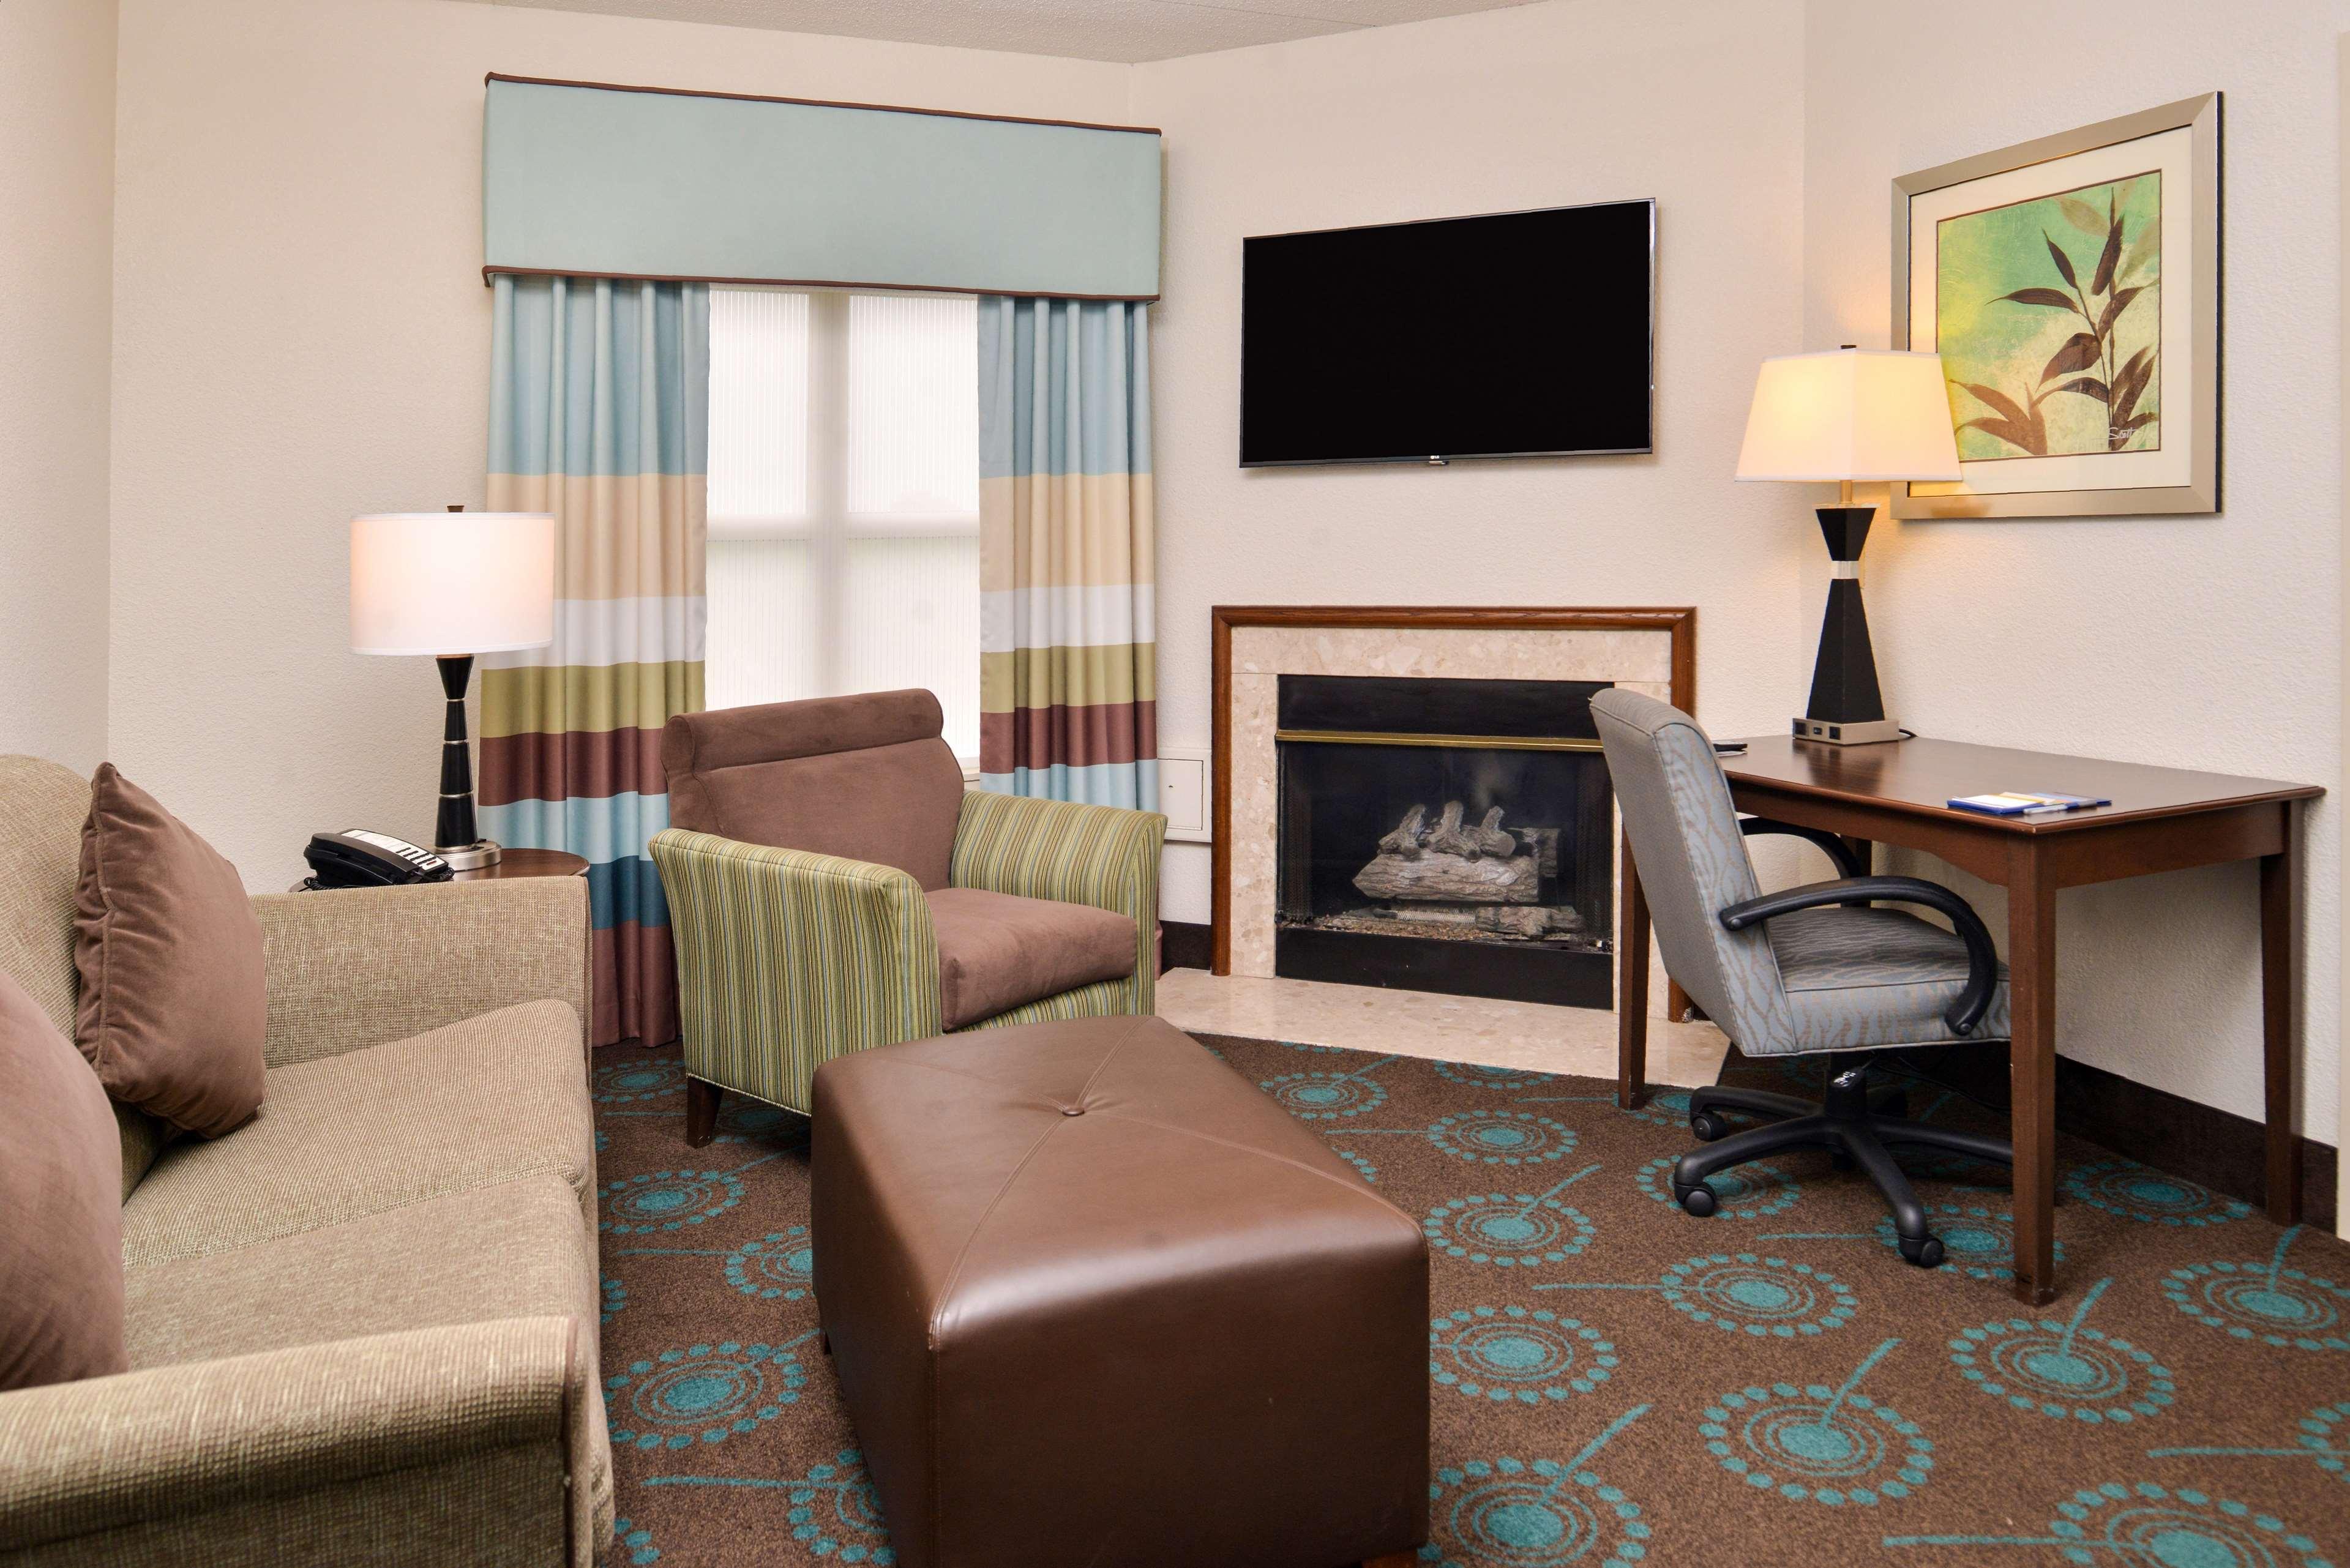 Hampton Inn & Suites Newport News (Oyster Point) image 21